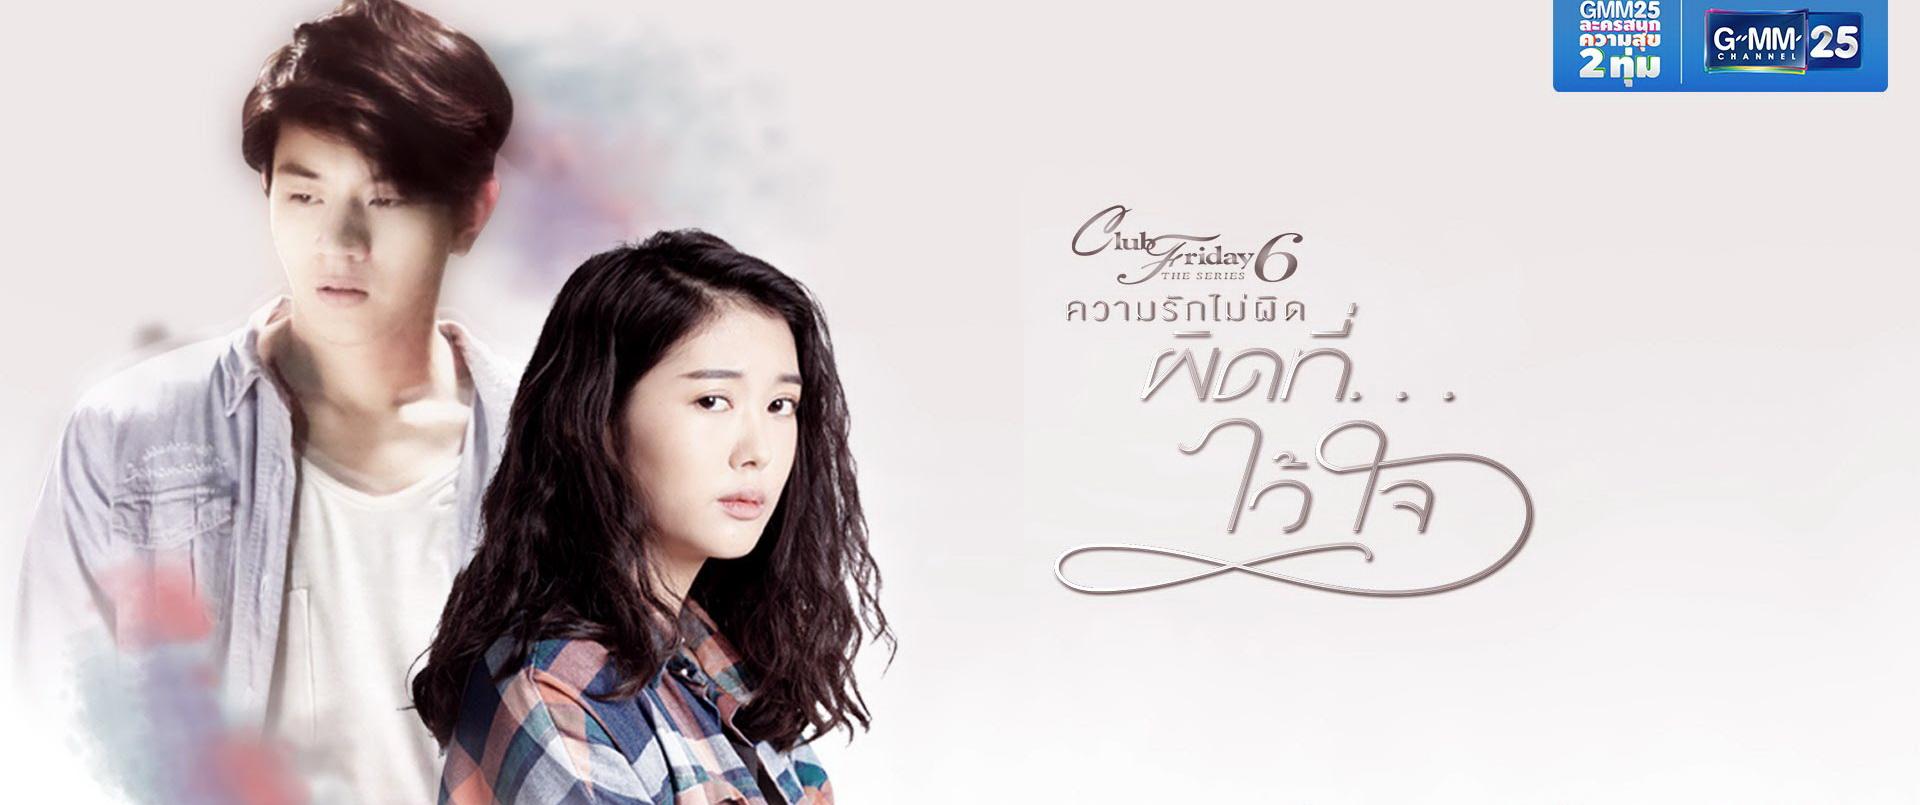 Lakornthais.com-ขาย DVD ละครไทย ราคาถูก แผ่นละ 20 บาทค่ะ !!!